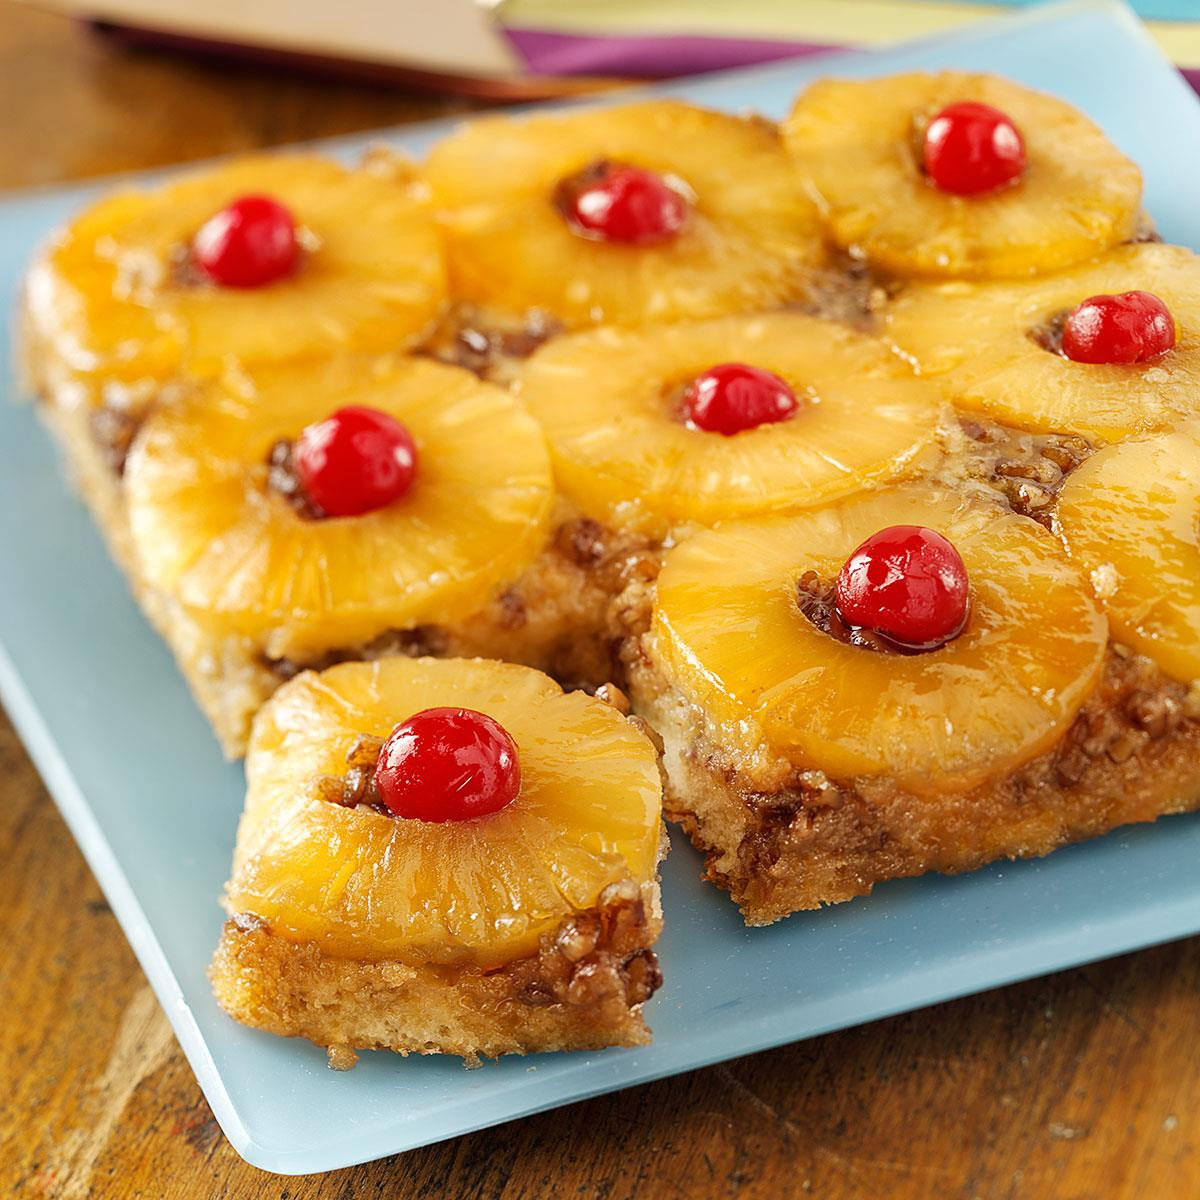 Pineapple Upside Down Cake Recipes  Classic Pineapple Upside Down Cake Recipe